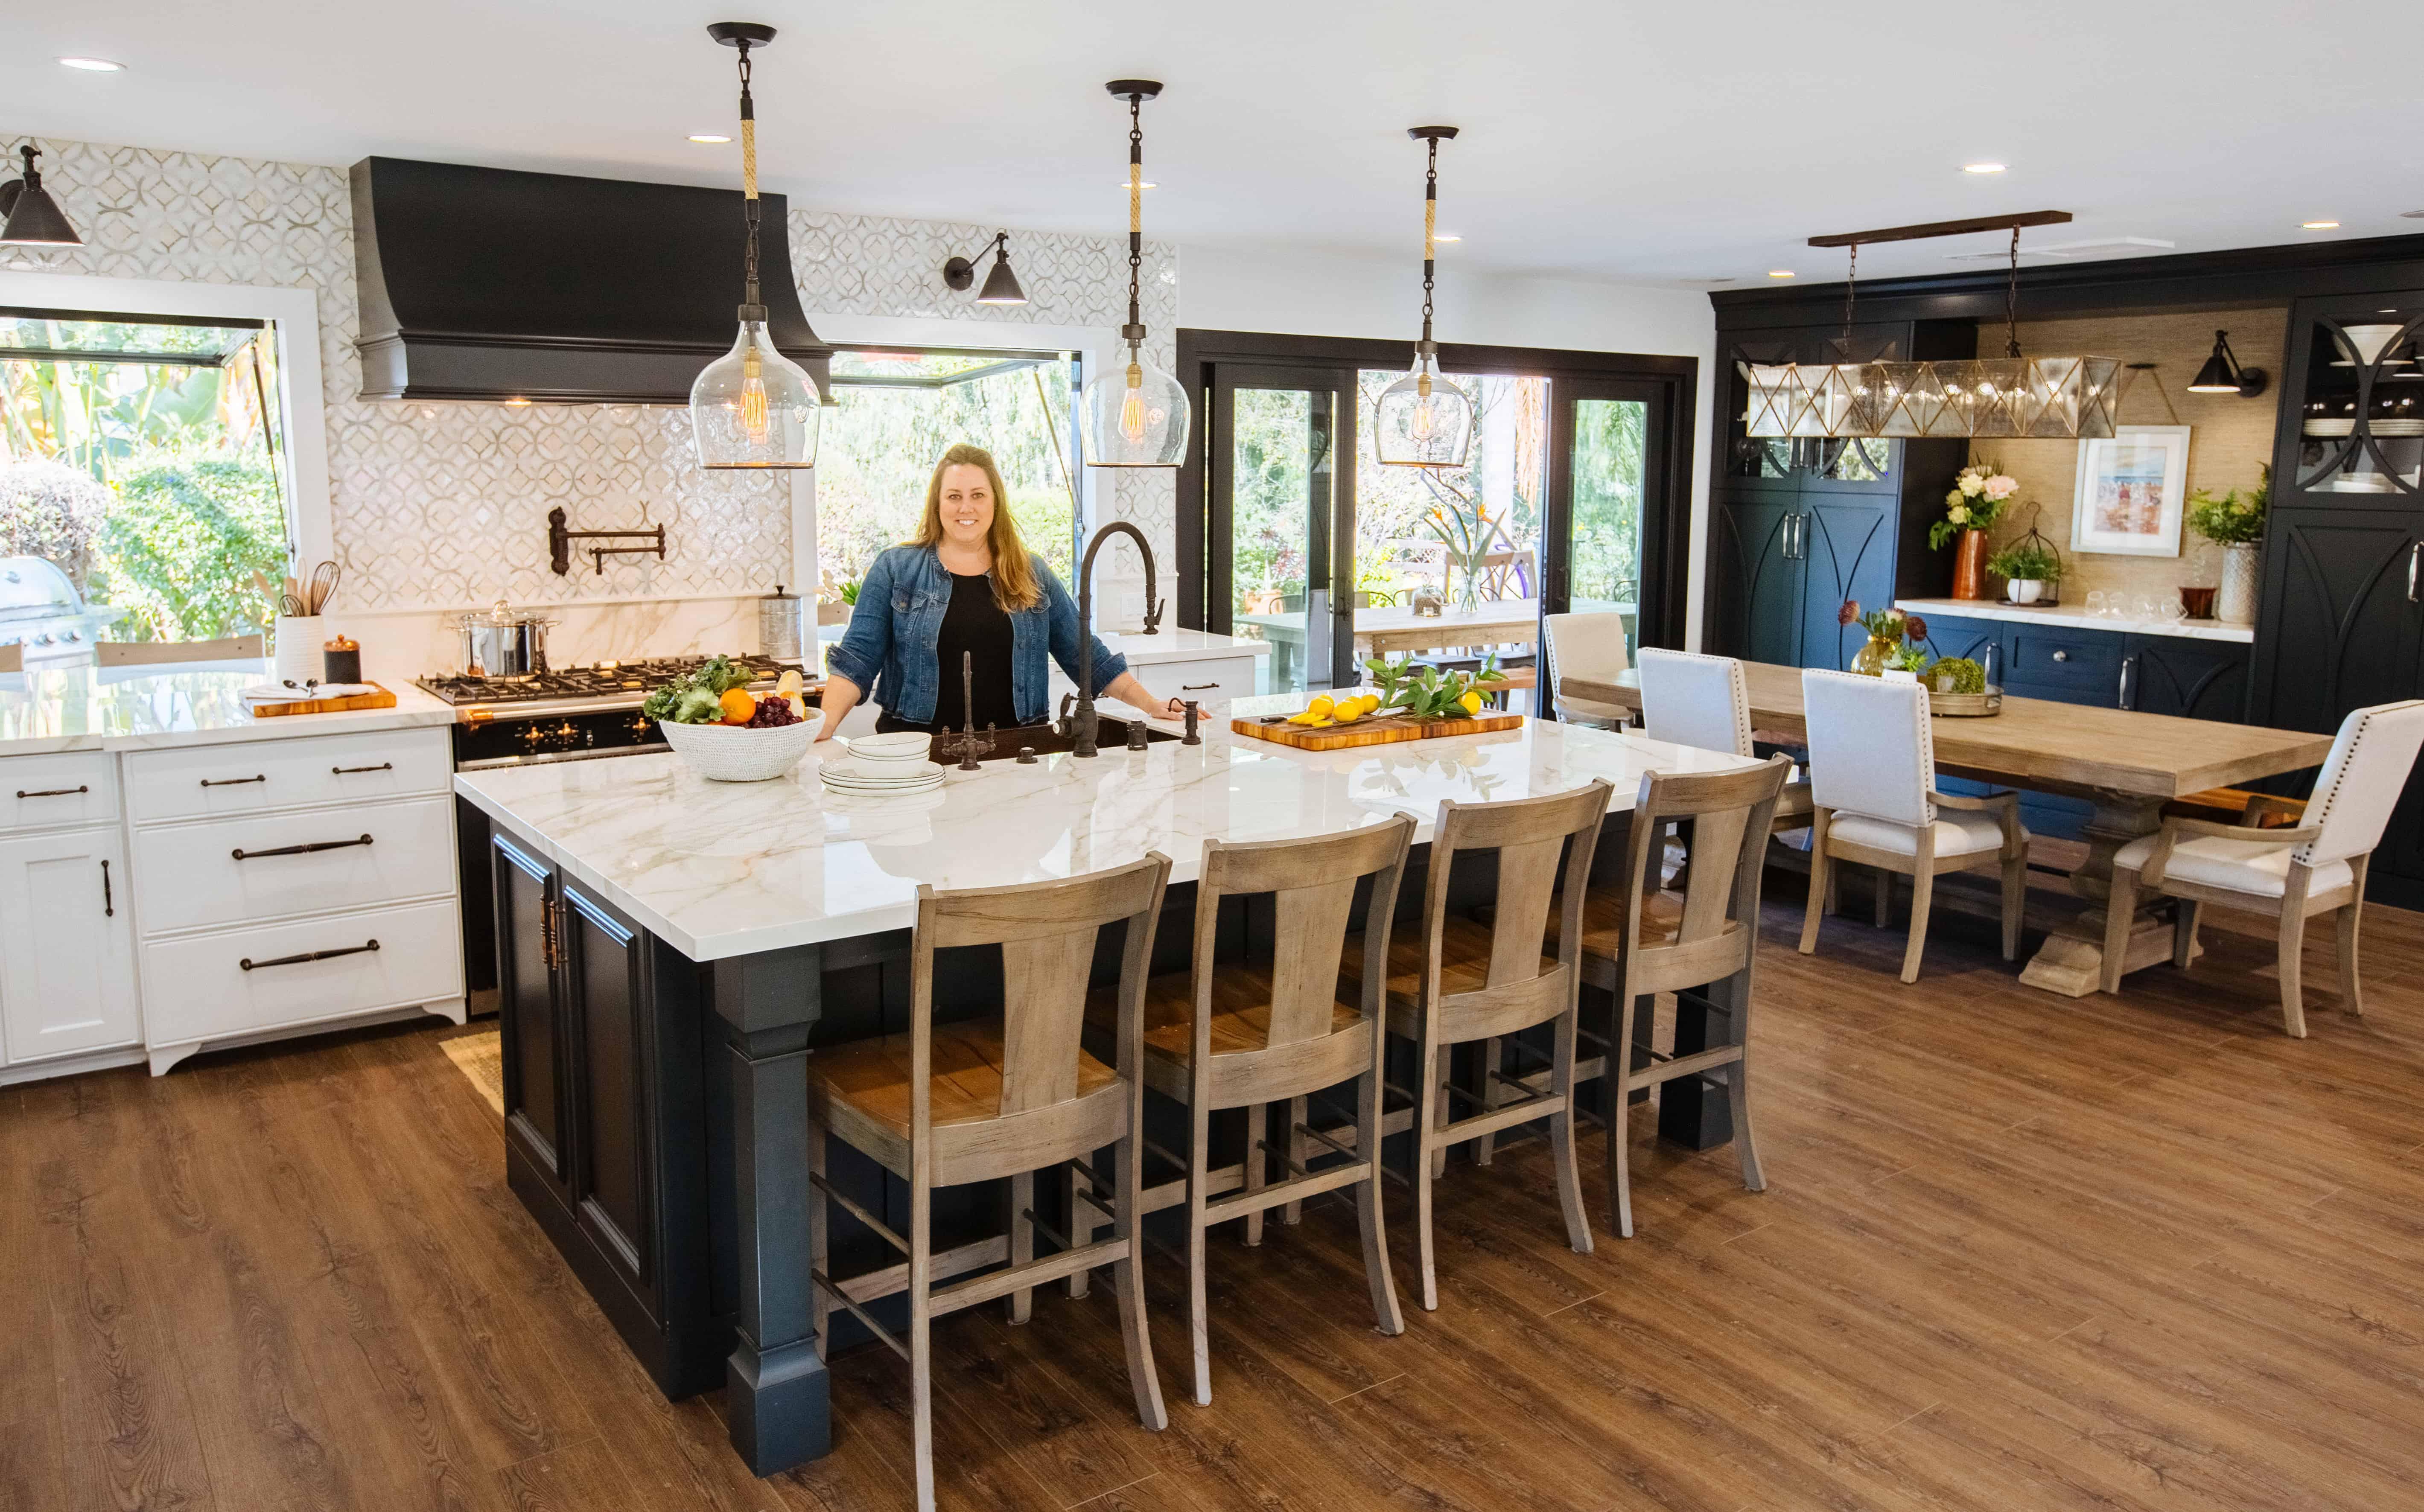 Carter showcasing a beautiful kitchen remodel